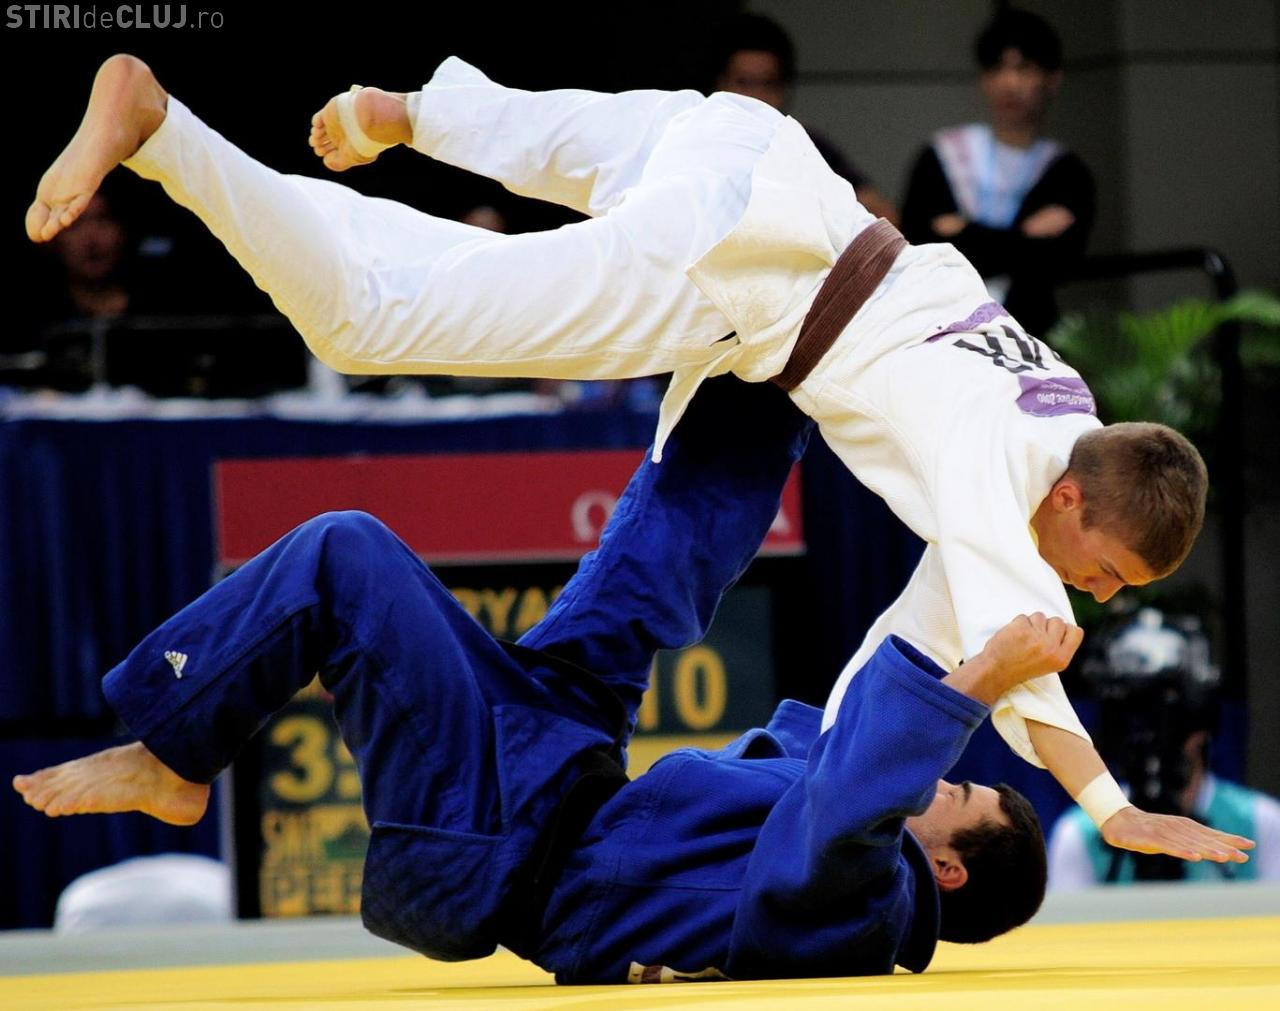 România, reprezentată de 16 sportivi la Campionatul Mondial de Judo, de la Budapesta